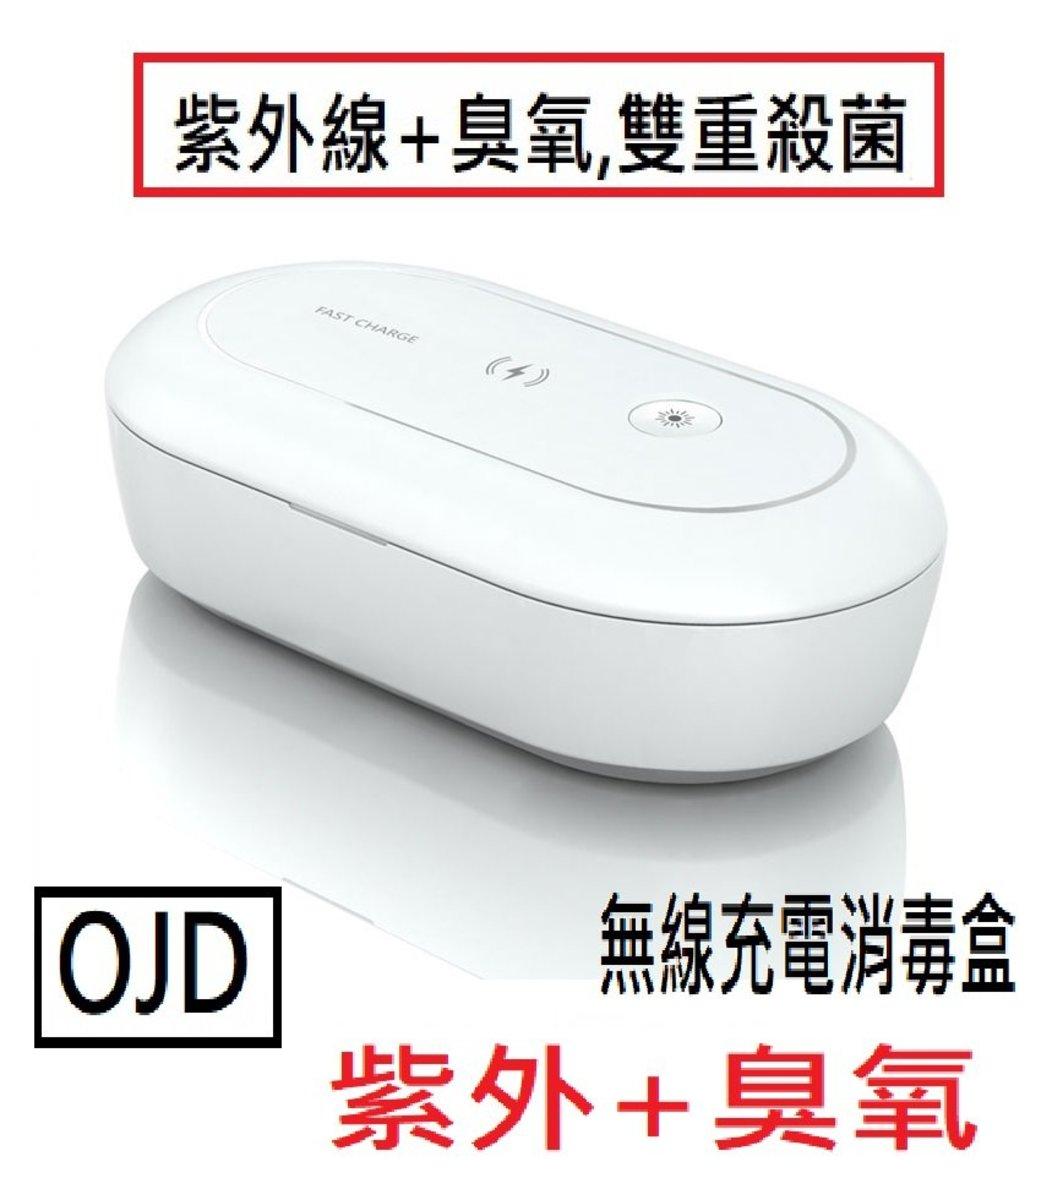 OJD-L03 多功能無線充電+臭氧+紫外光消毒盒UV-Box